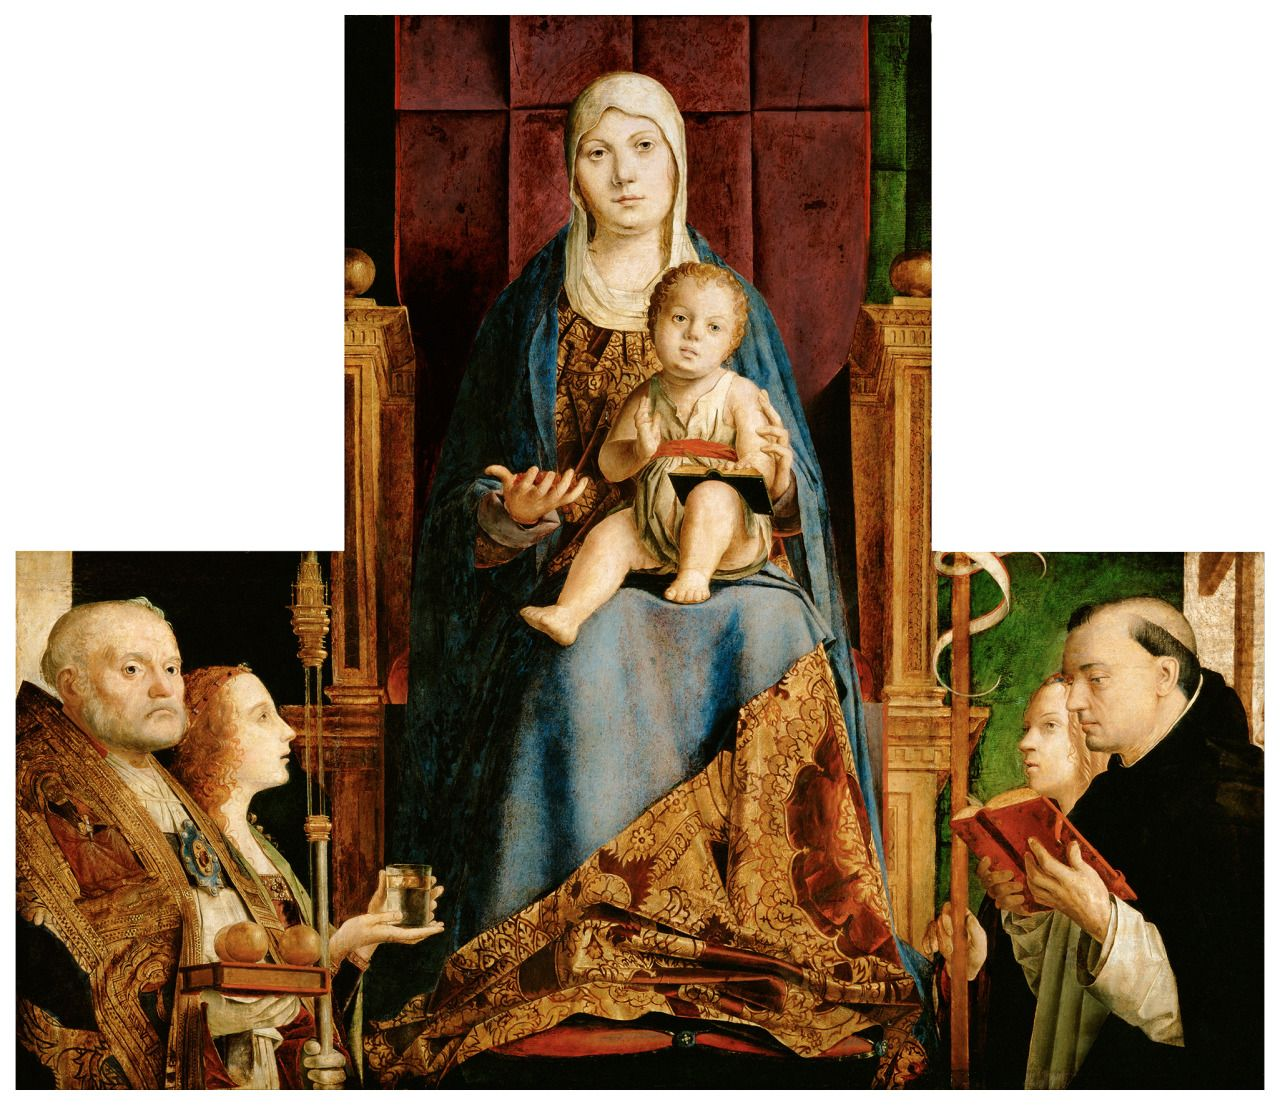 MESSINA Antonello da - Madone avec St Nicolas Ste Ursule et St Dominique - 1475